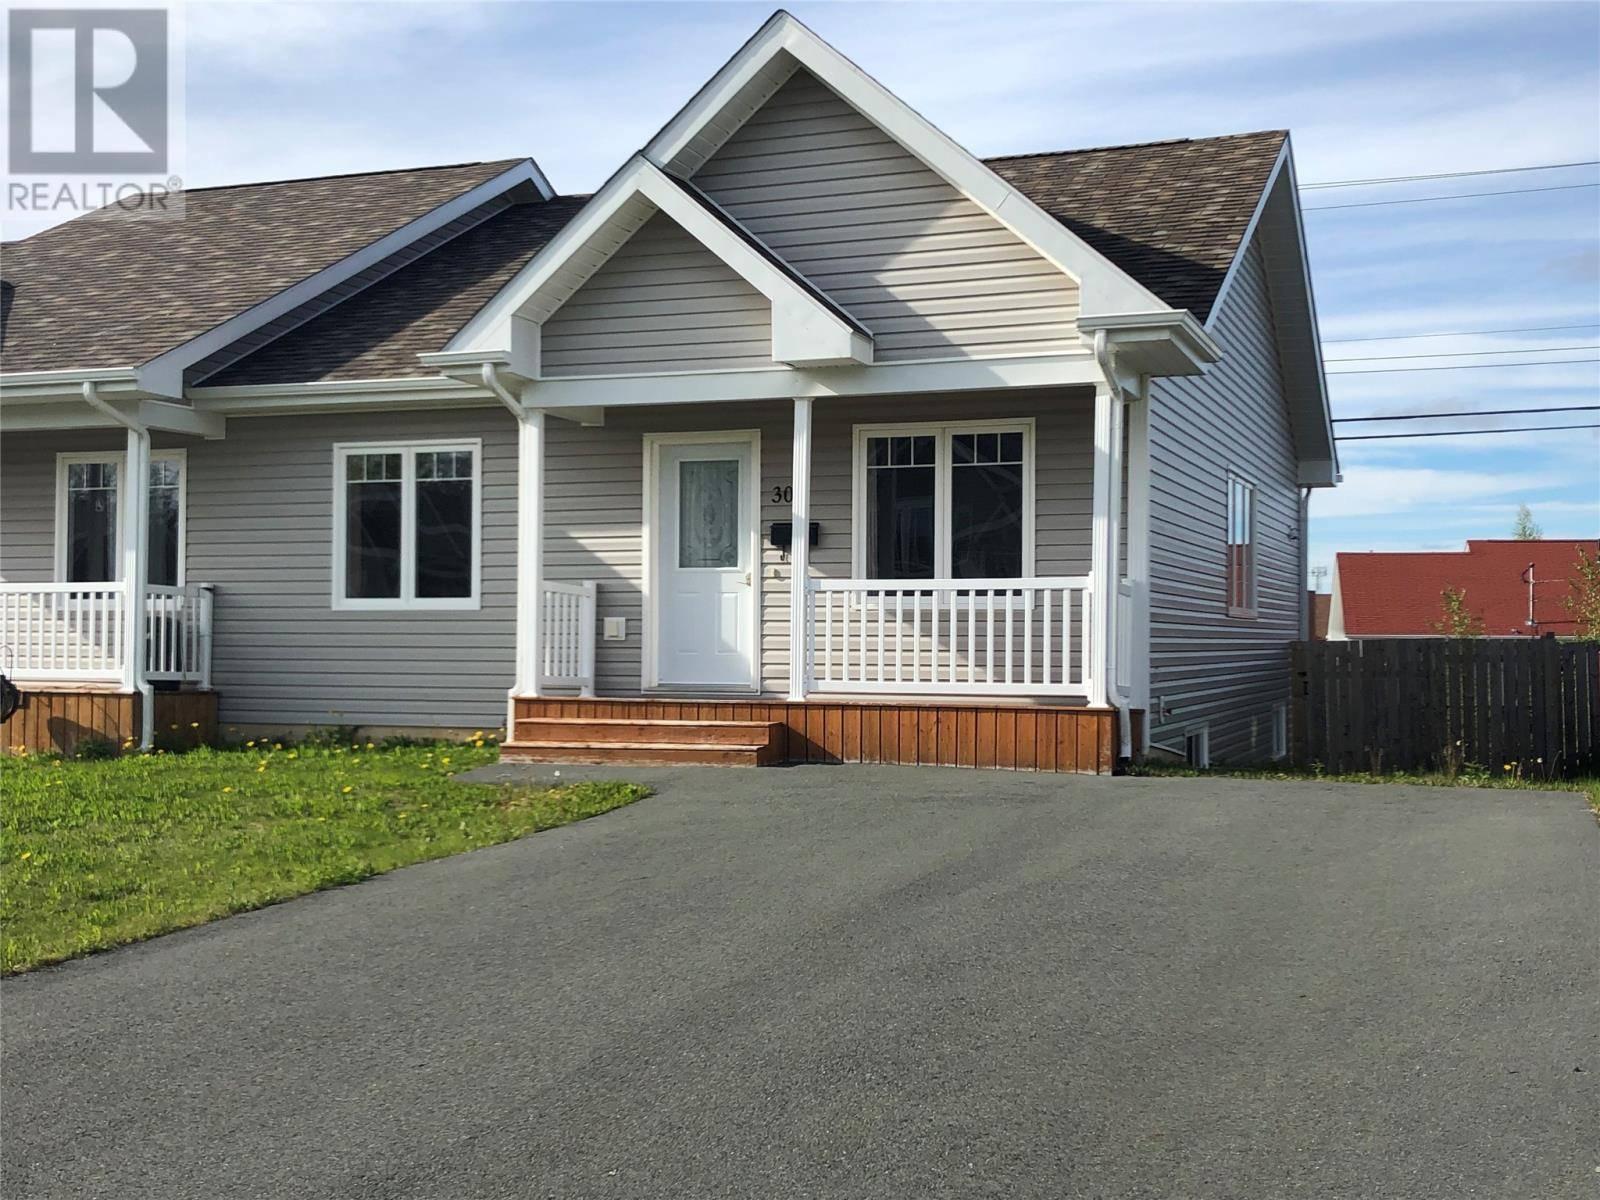 House for sale at 30 Yeager St Gander Newfoundland - MLS: 1192216